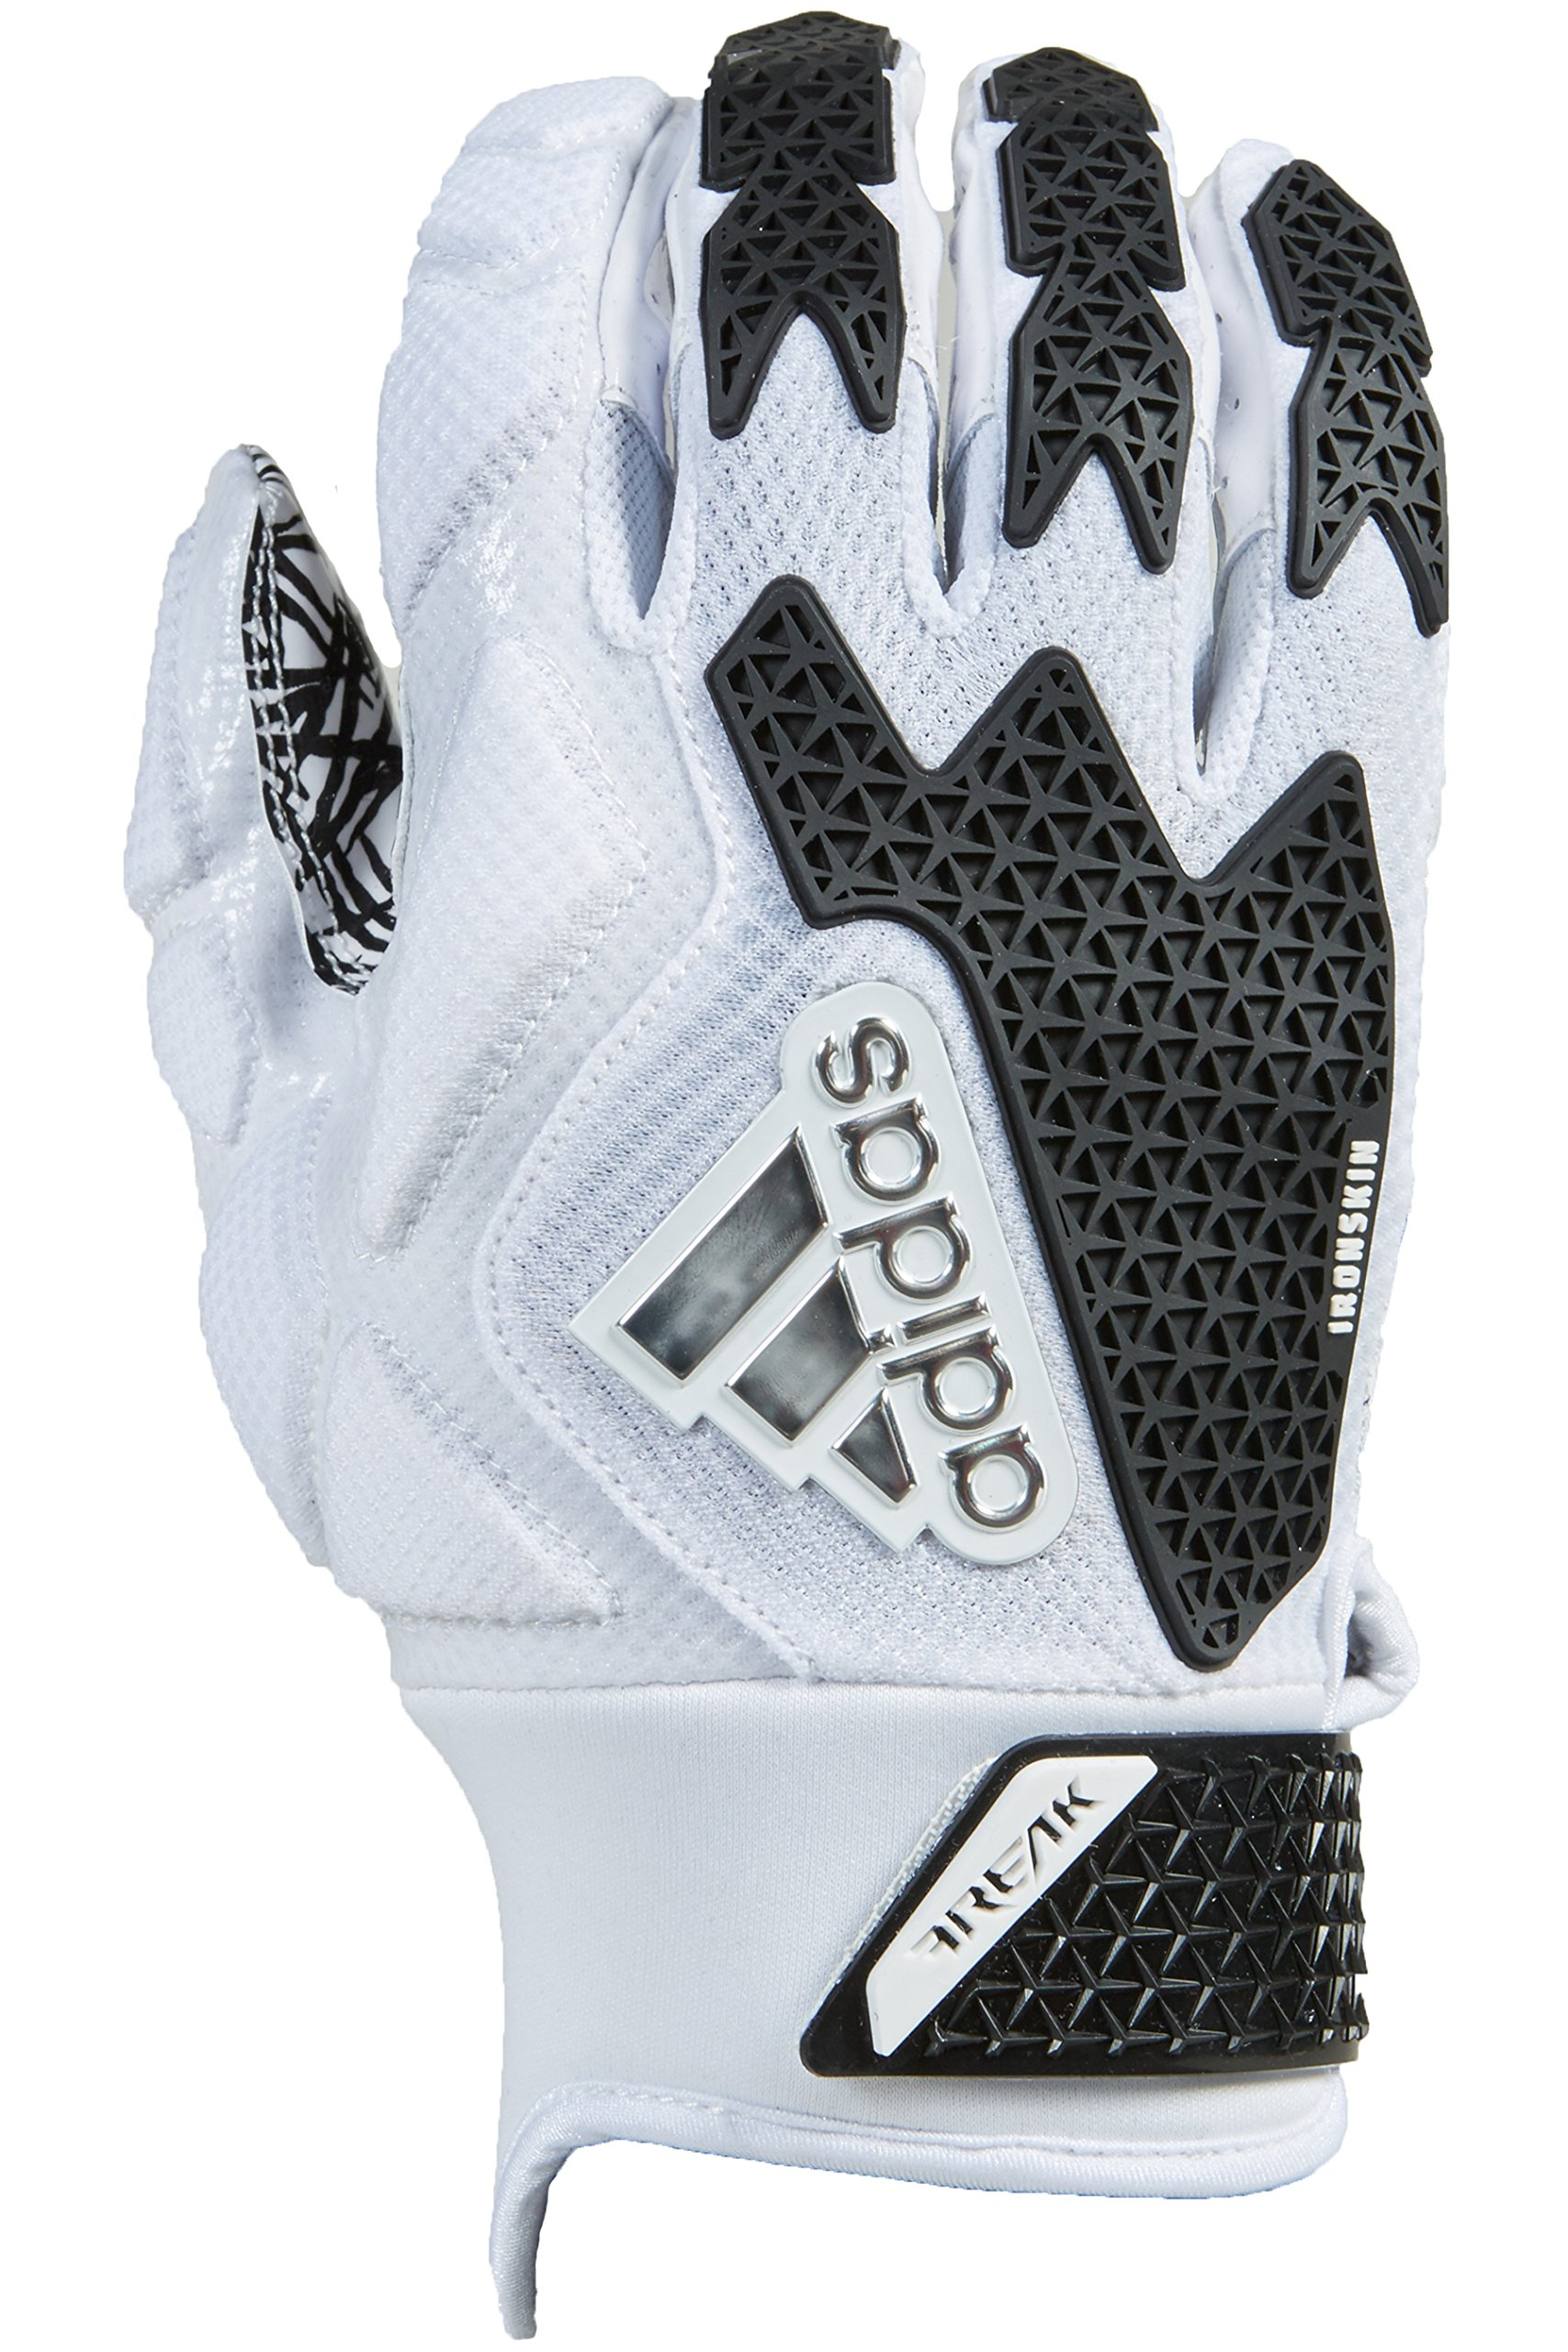 adidas Freak 3.0 Padded Receiver's Gloves, White/Black, 3X-Large